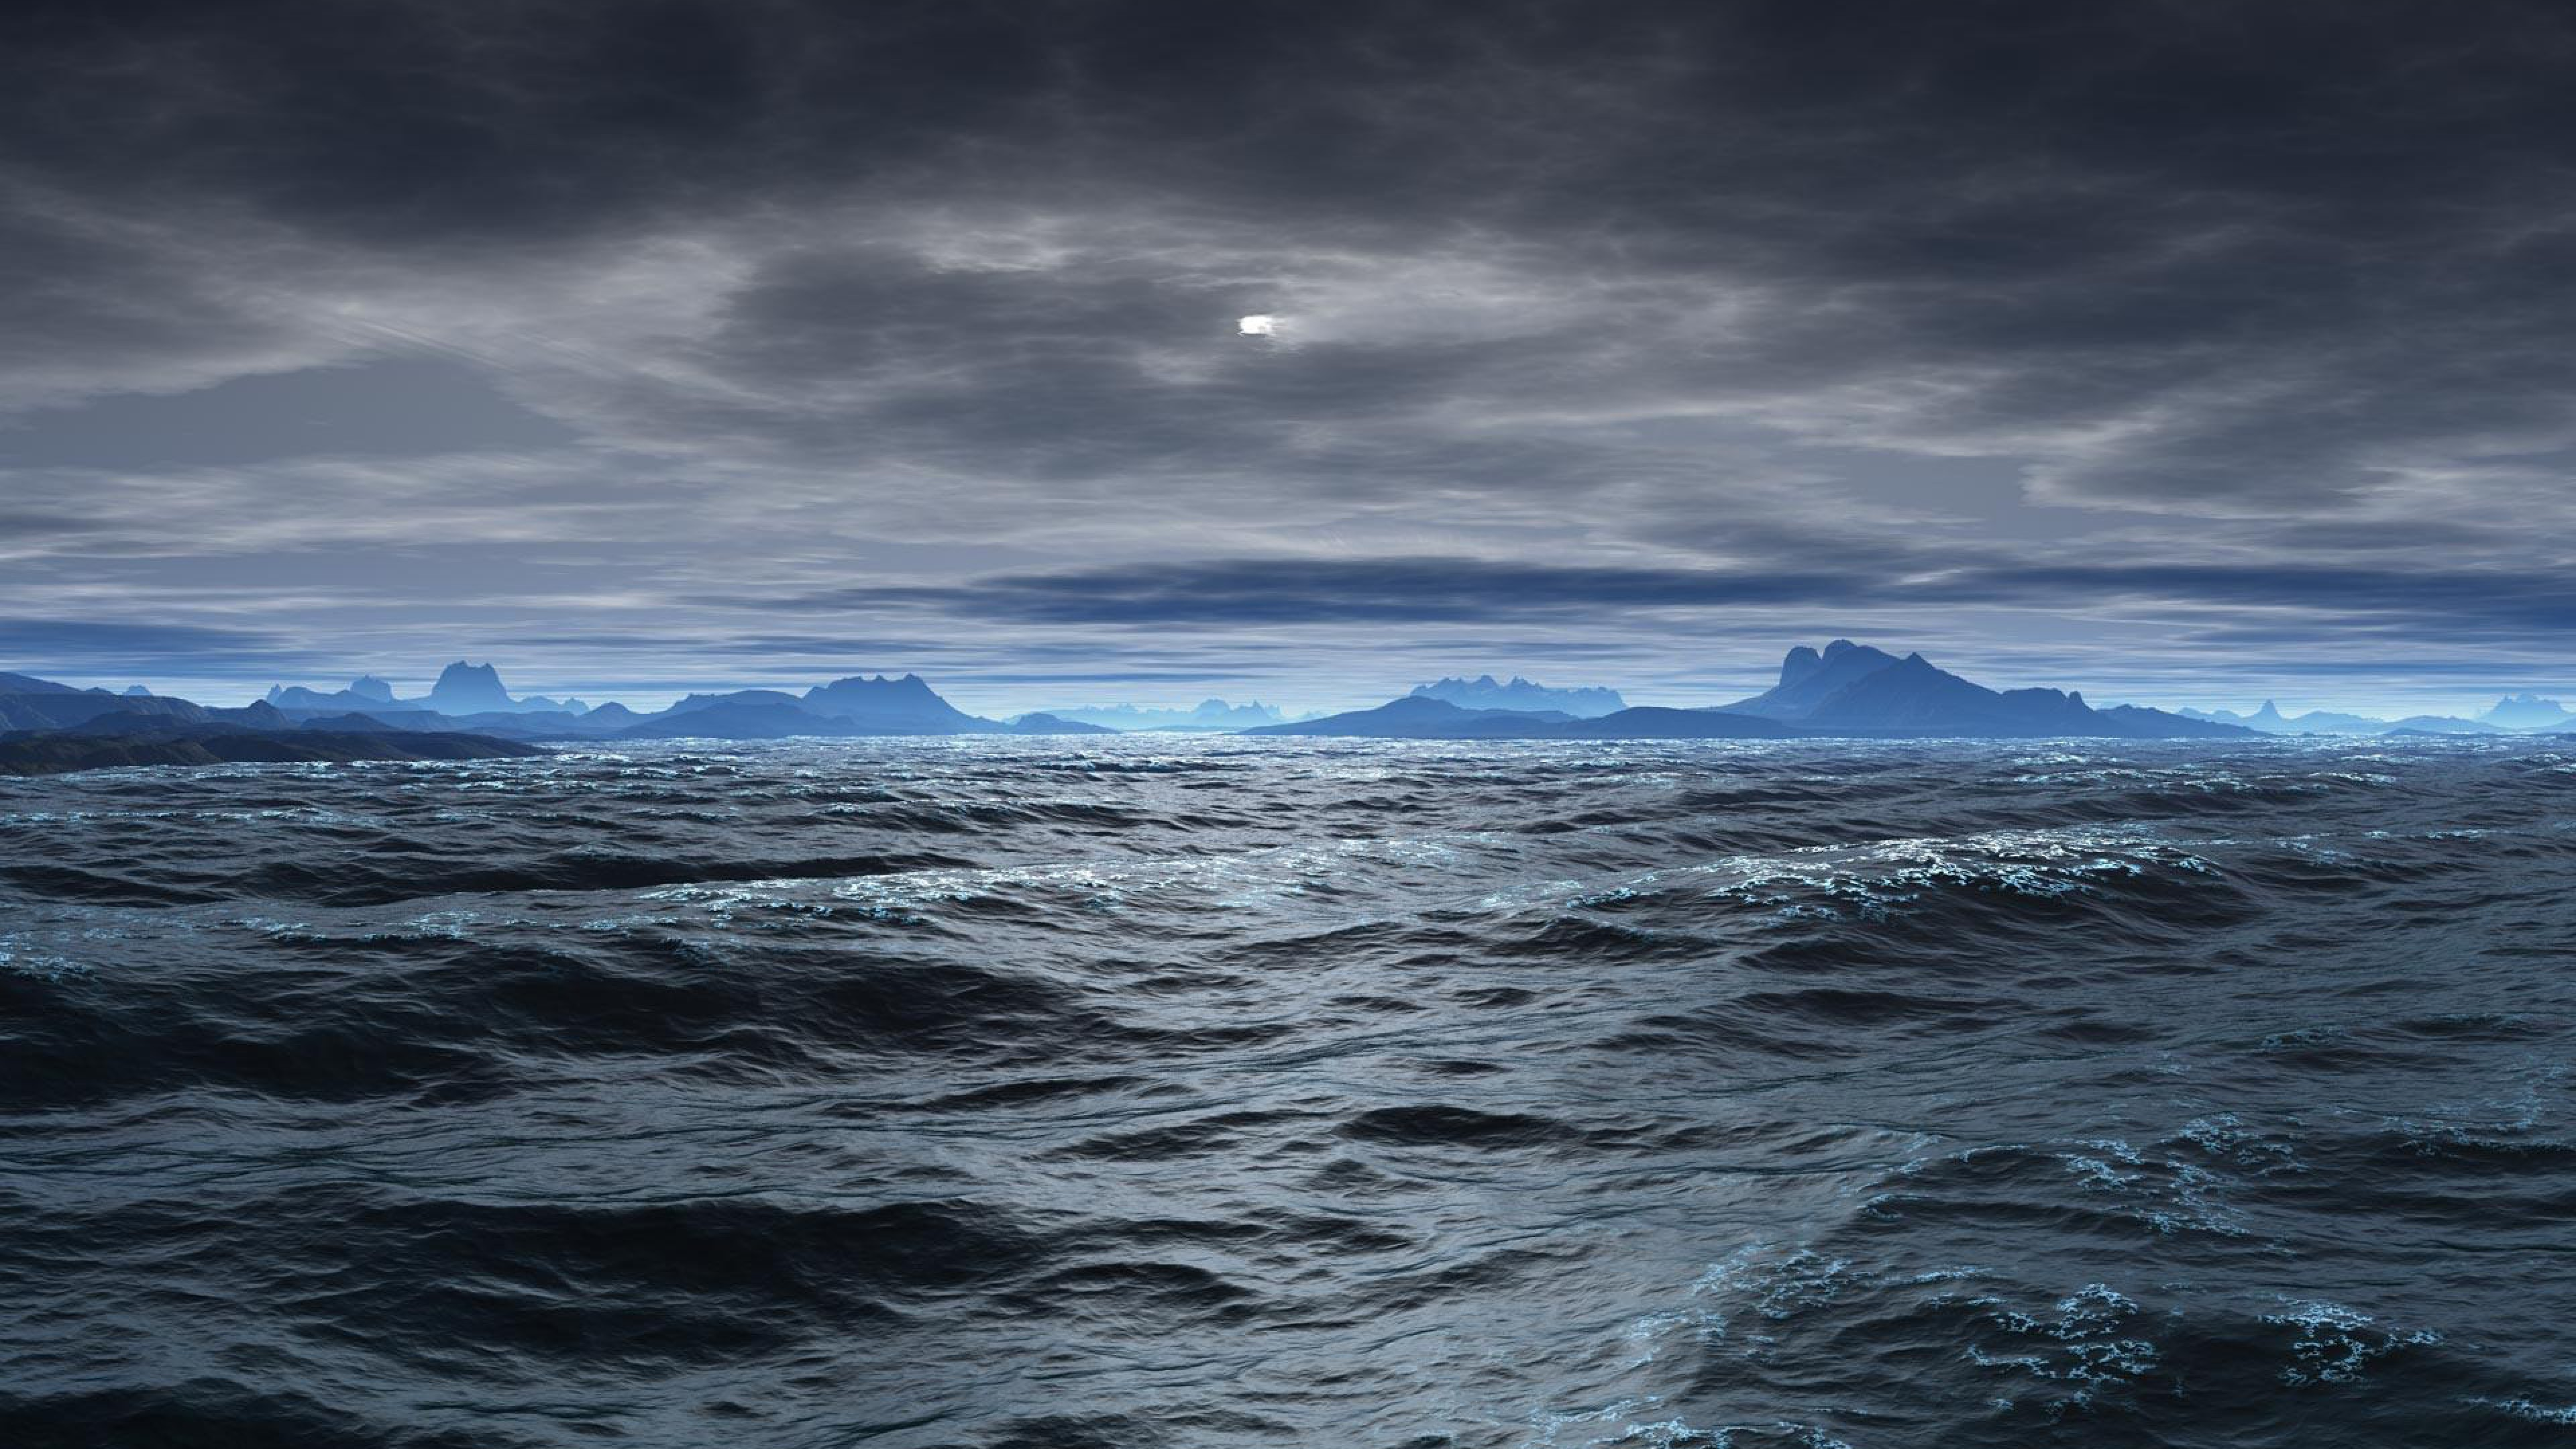 Fondos de pantalla Océano con nubes de tormenta